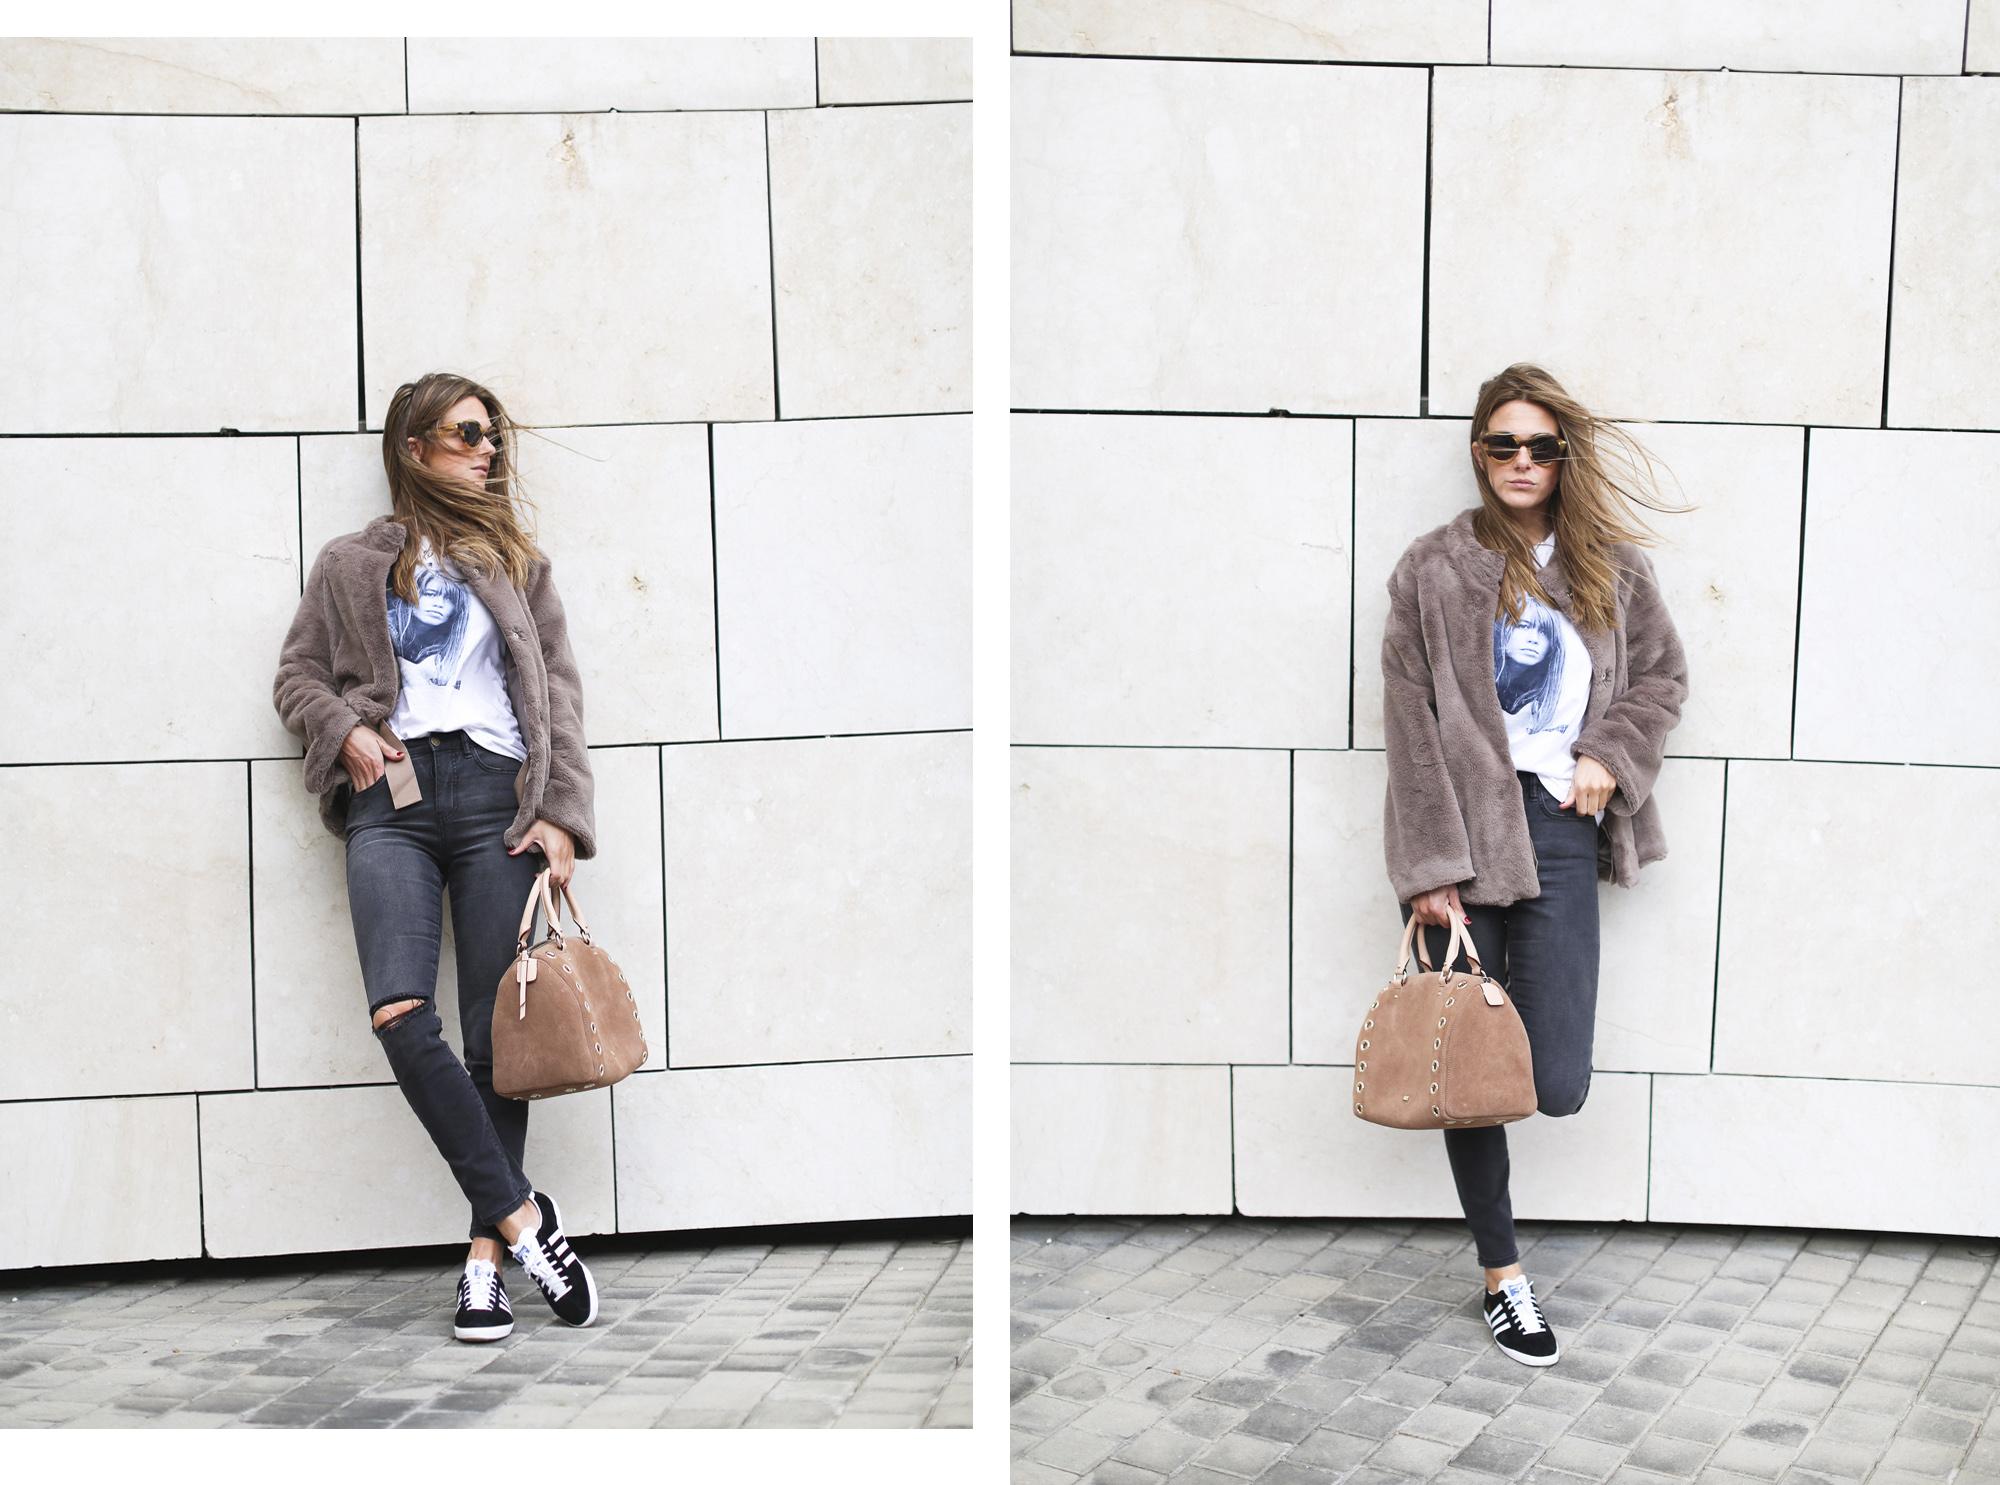 Clochet_streetstyle_fashionblogger_bilbao_guggenheim_purificaciongarcia_bolsoante_adidasgazelle-8